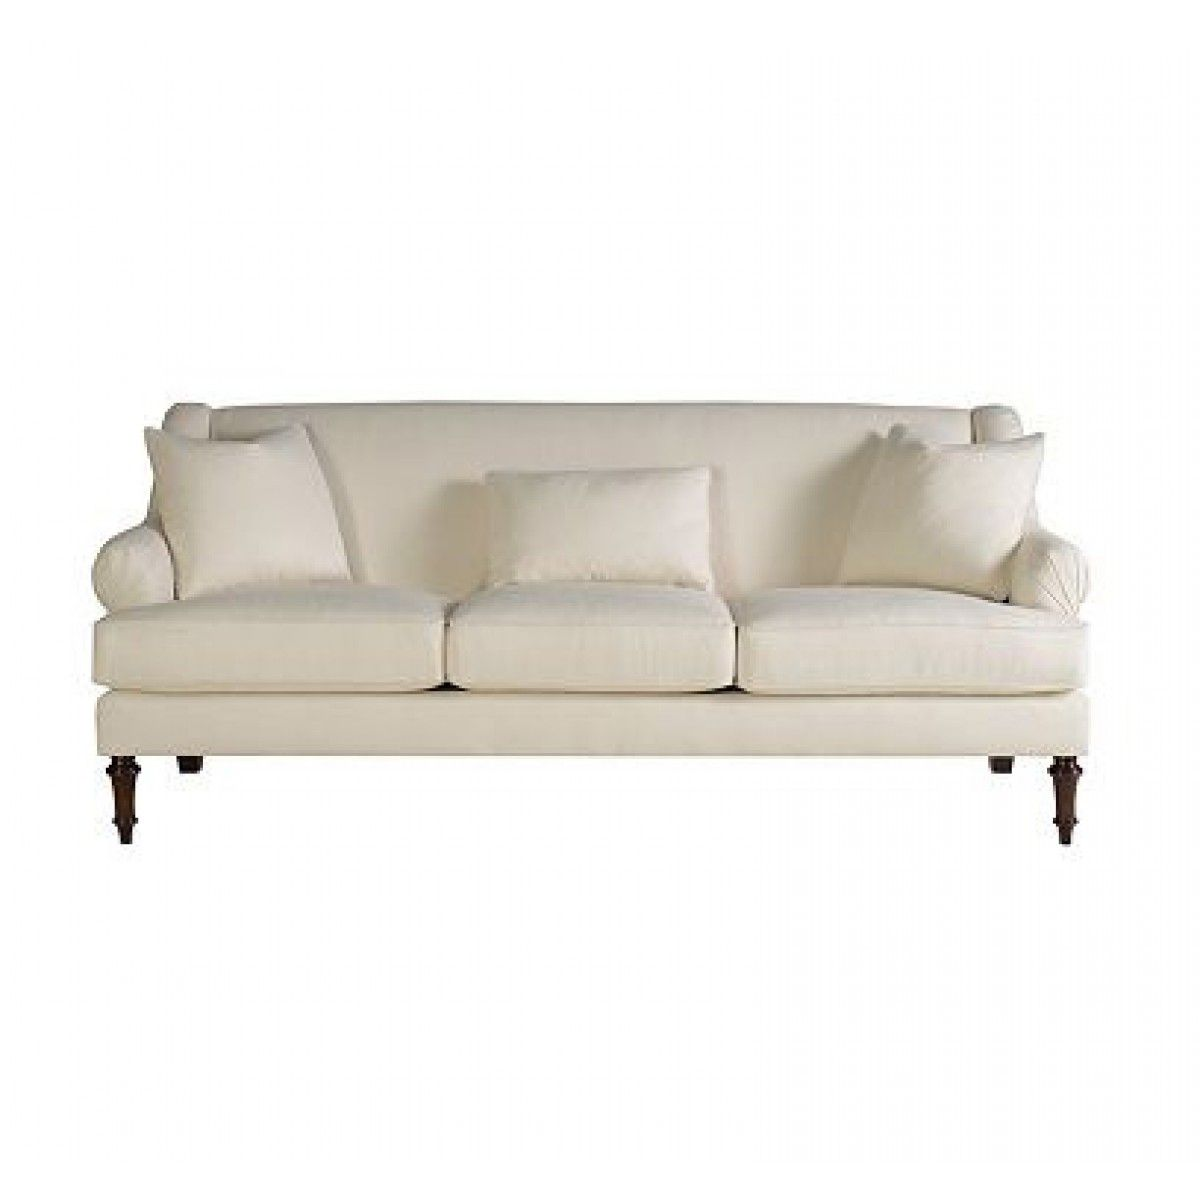 Henredon Upholstery Napoleon Tight Back Sofa